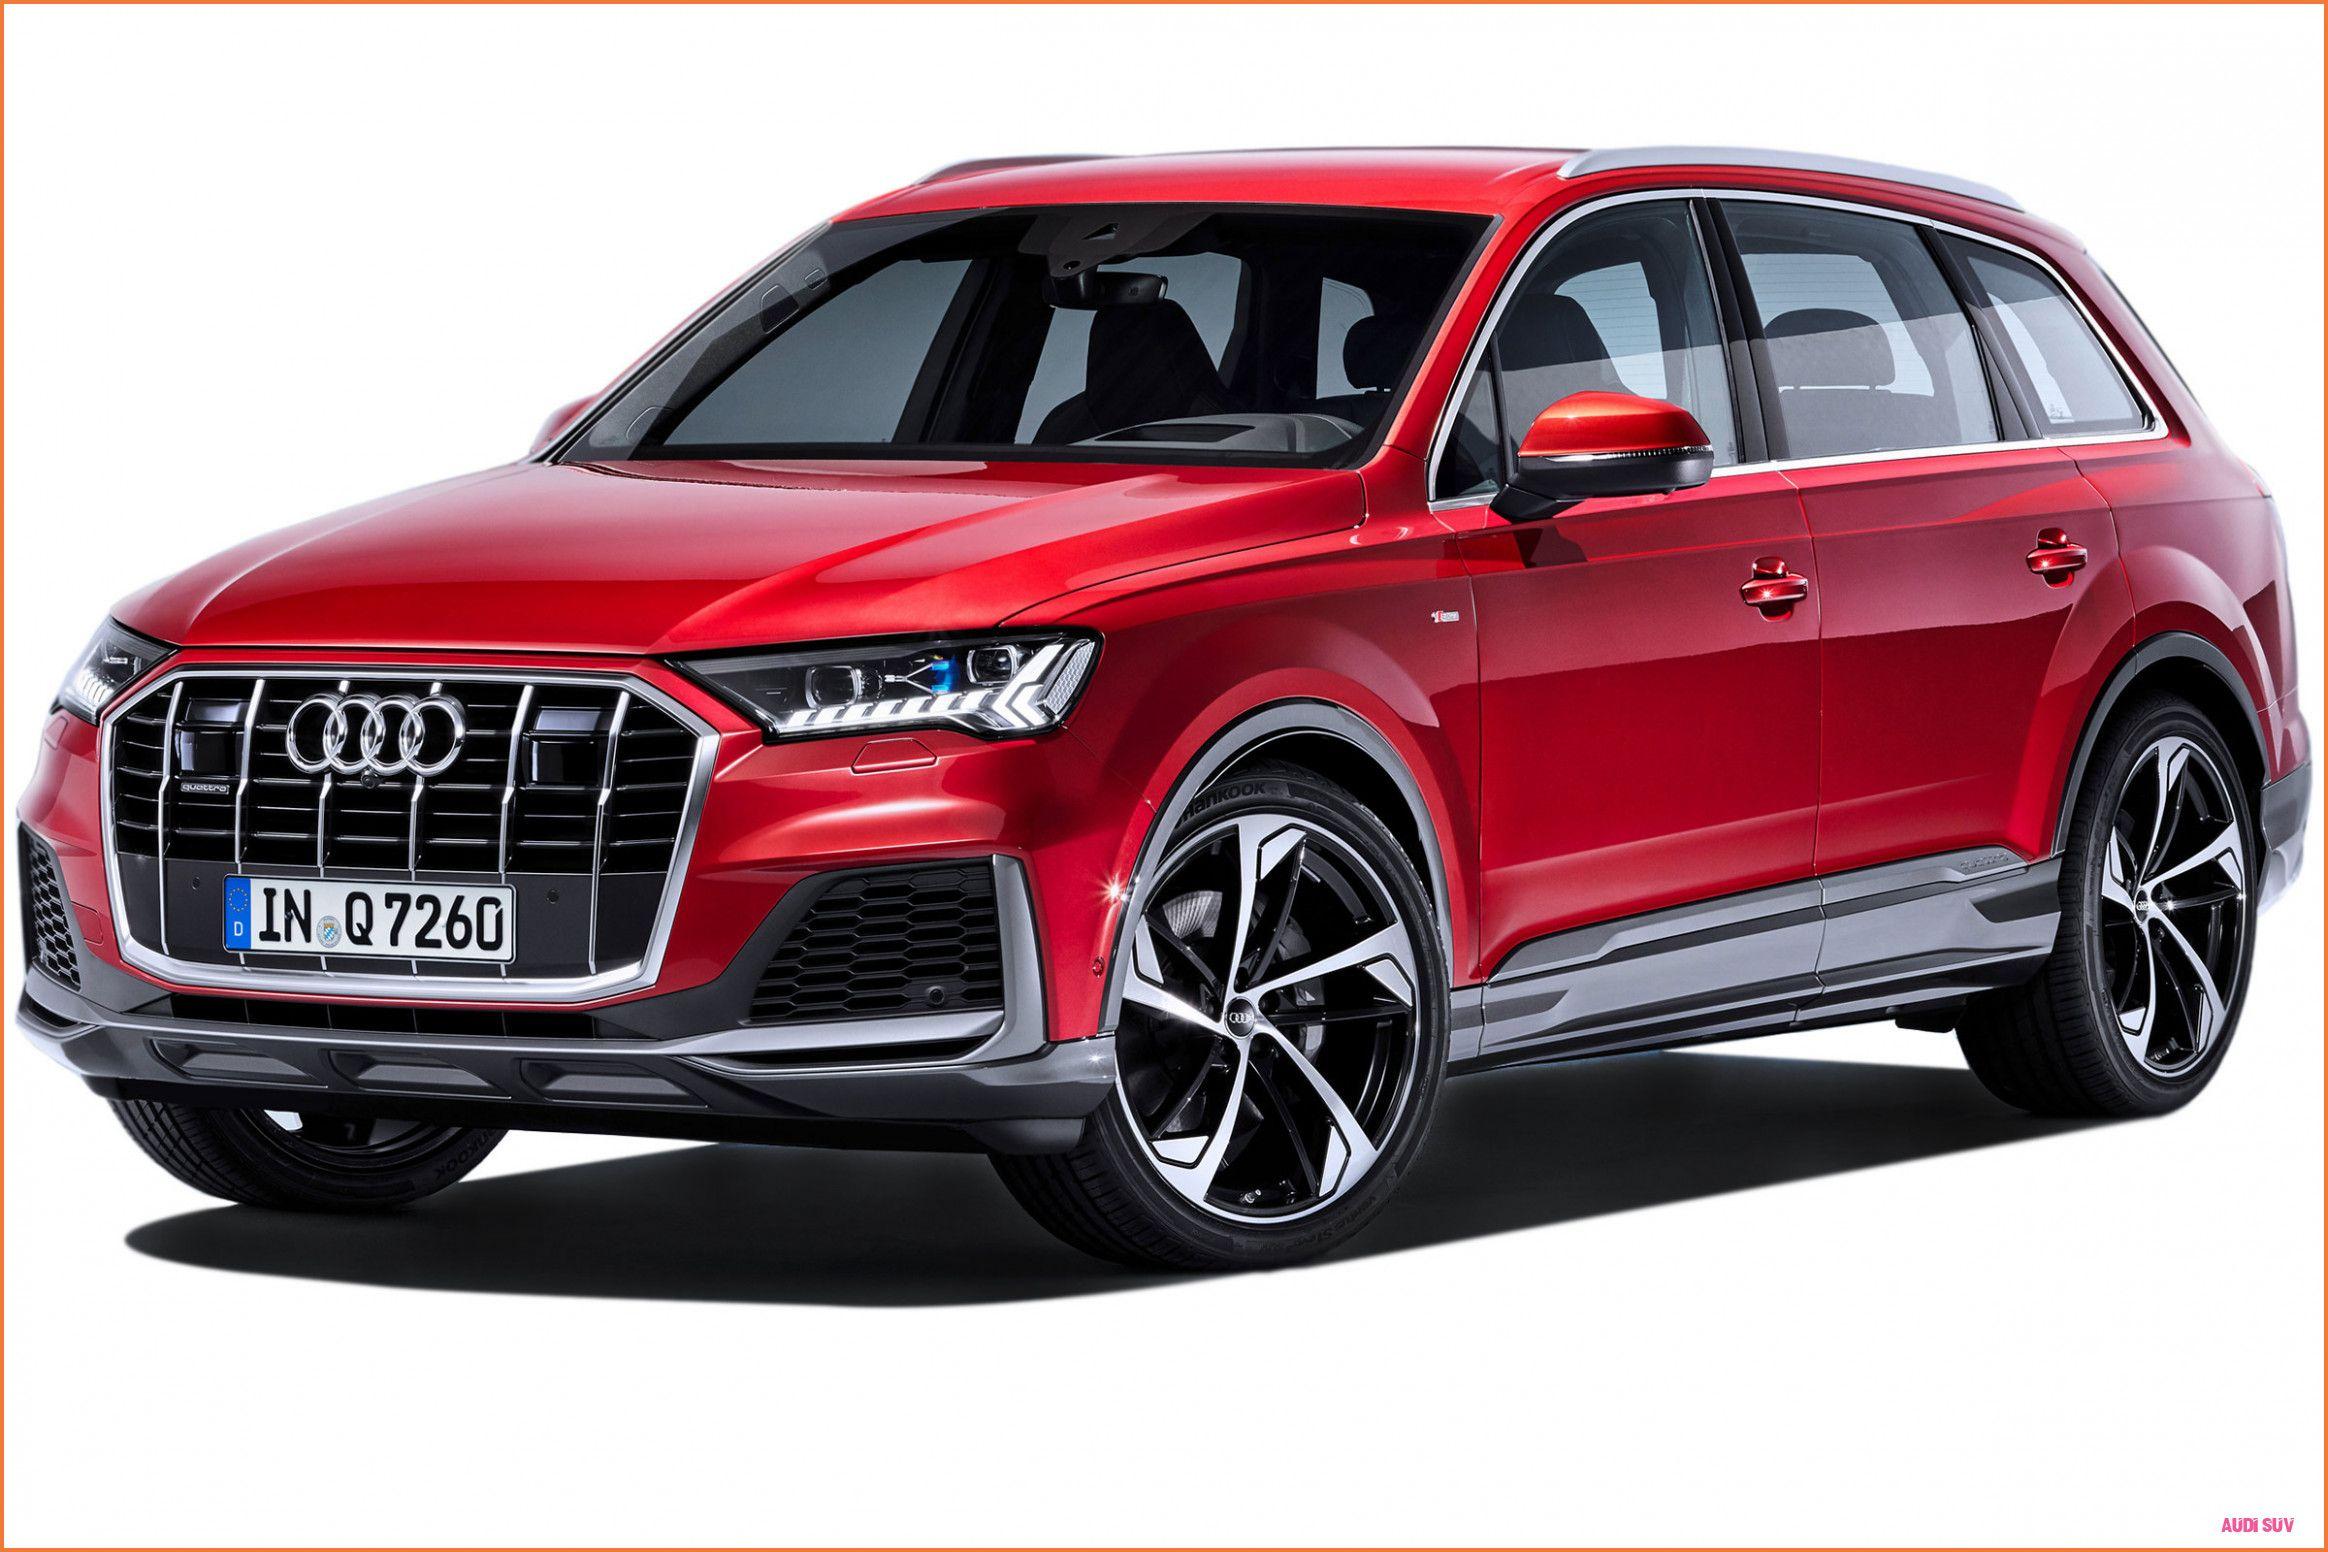 8 Unbelievable Facts About Audi Suv Audi Suv Https Www Carsneat Com 8 Unbelievable Facts About Audi Suv Audi Suv In 2020 Suv Audi Audi Suv